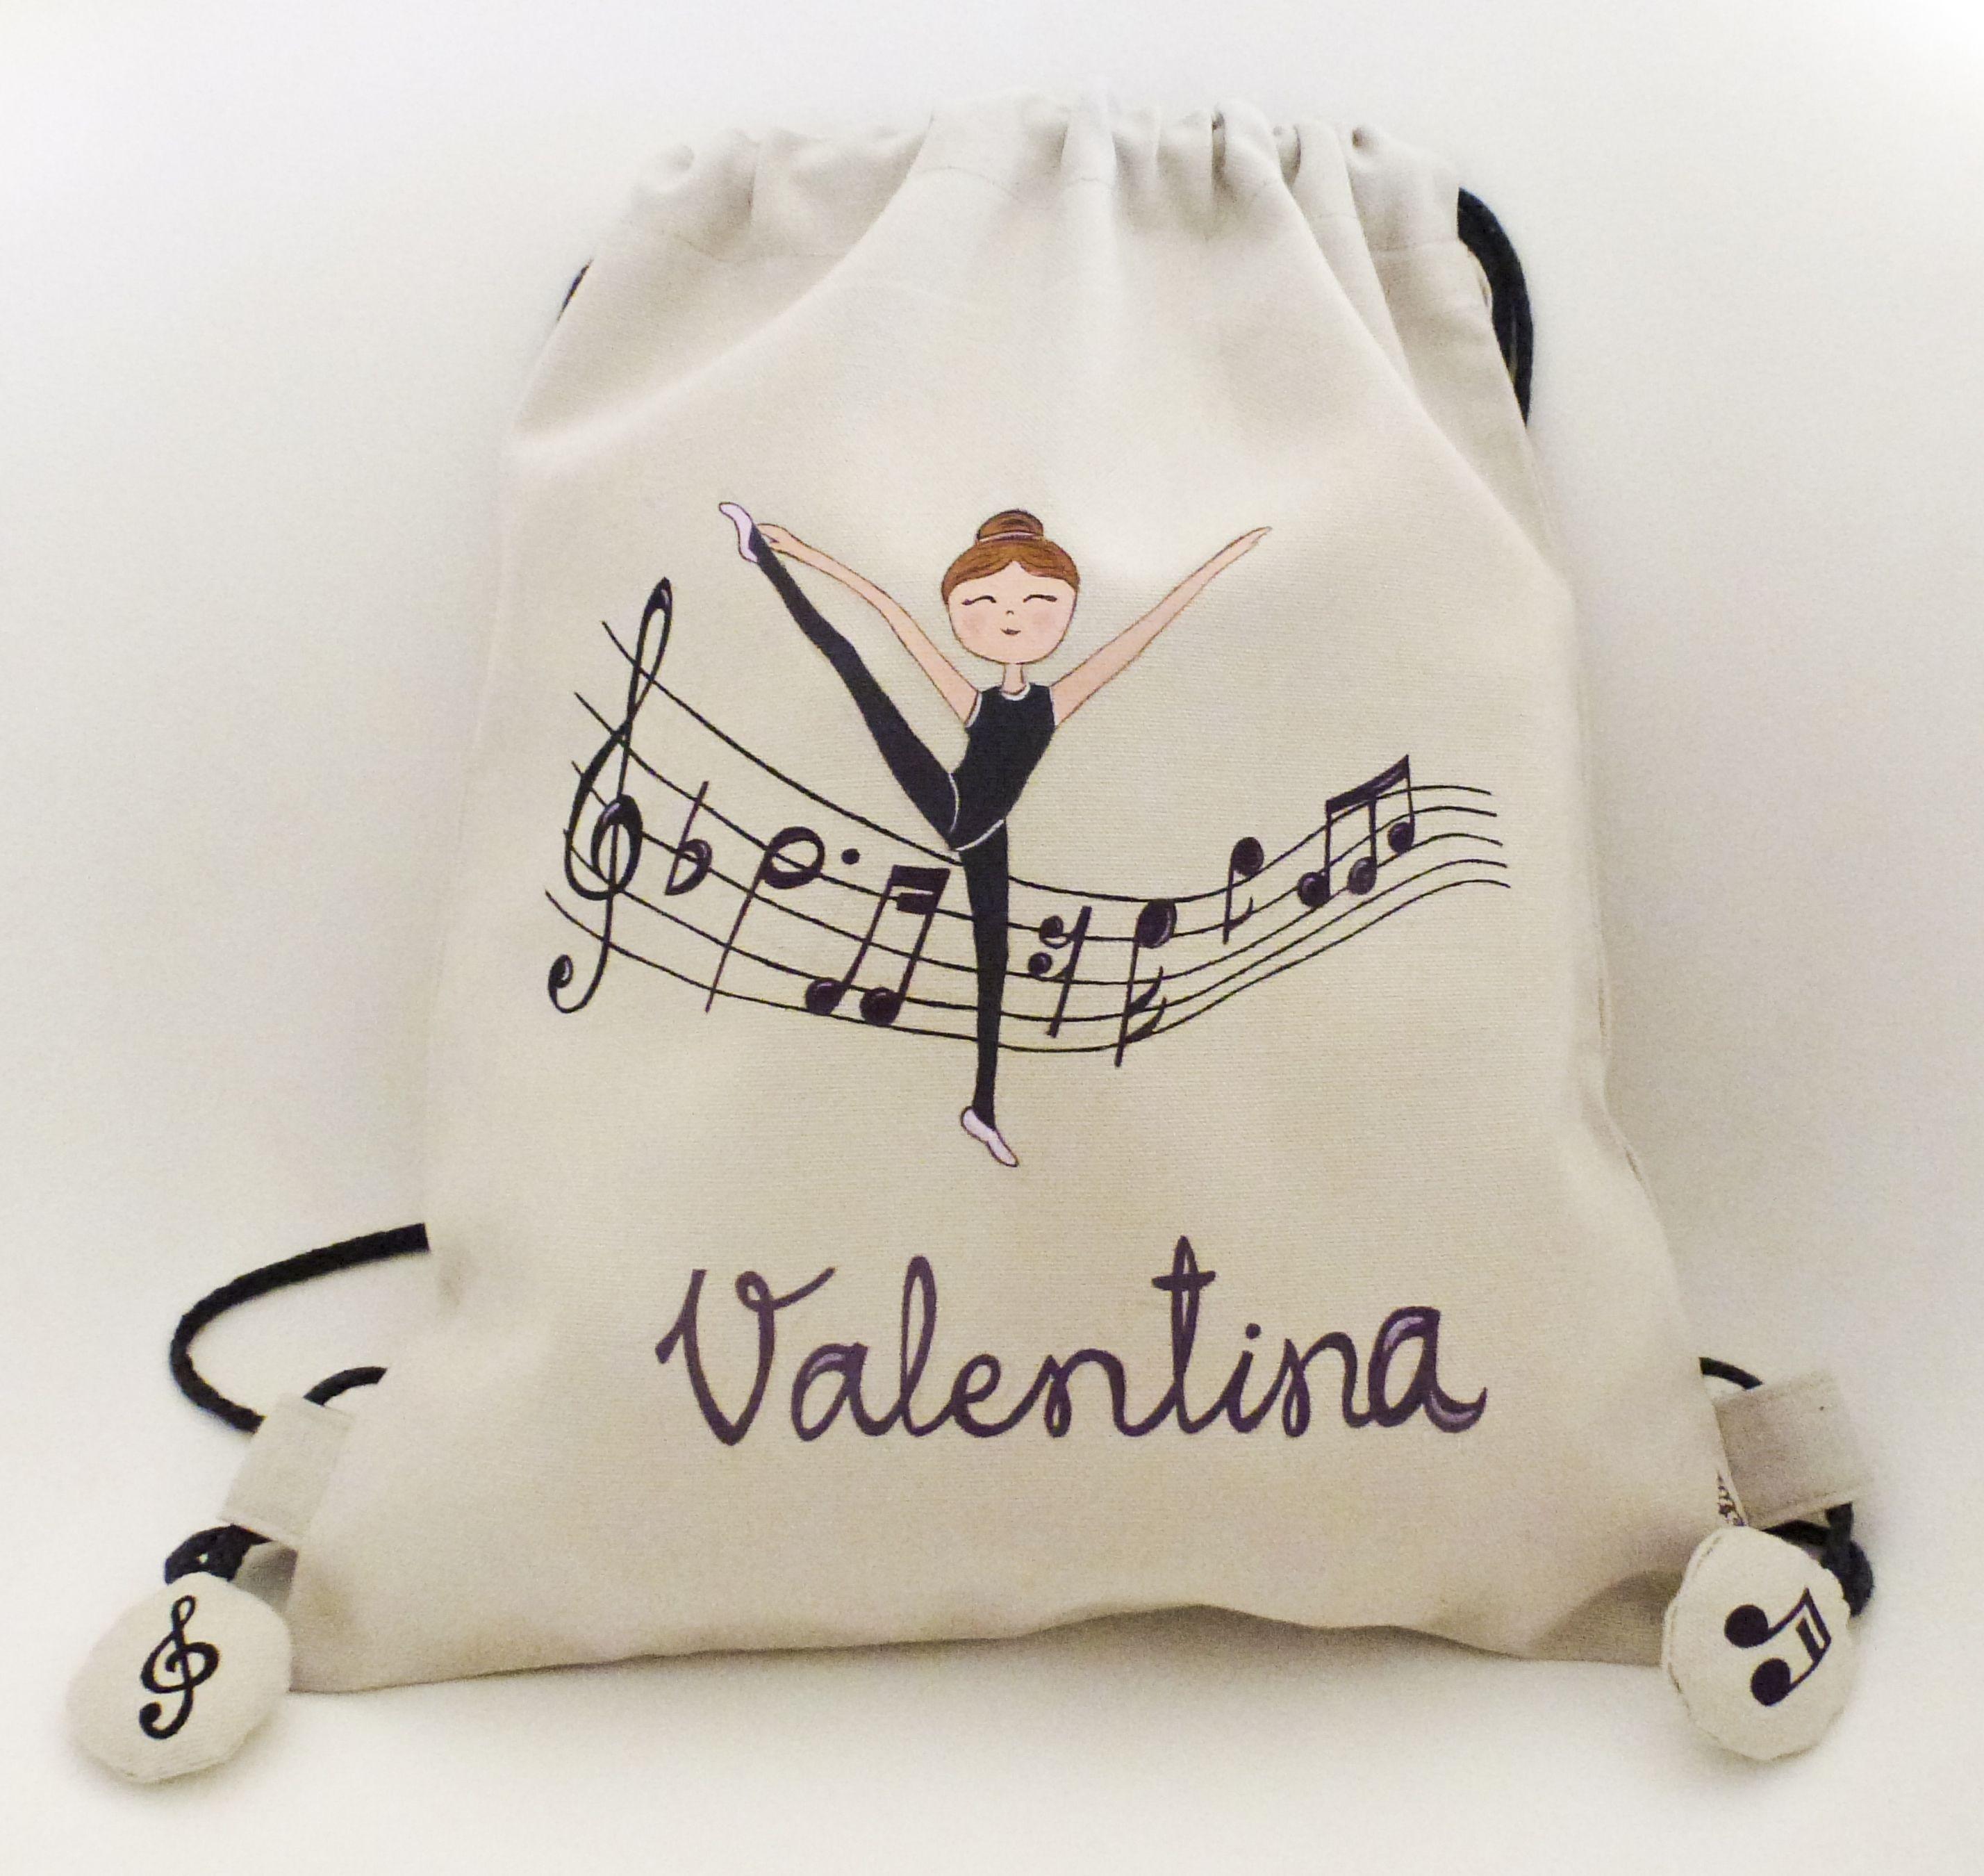 e707251f2 Así de bonita es la mochila que la pequeña Valentina va a llevar a sus  clases de gimnasia. Ella está encantada!! #mochilasniños #danza # ...